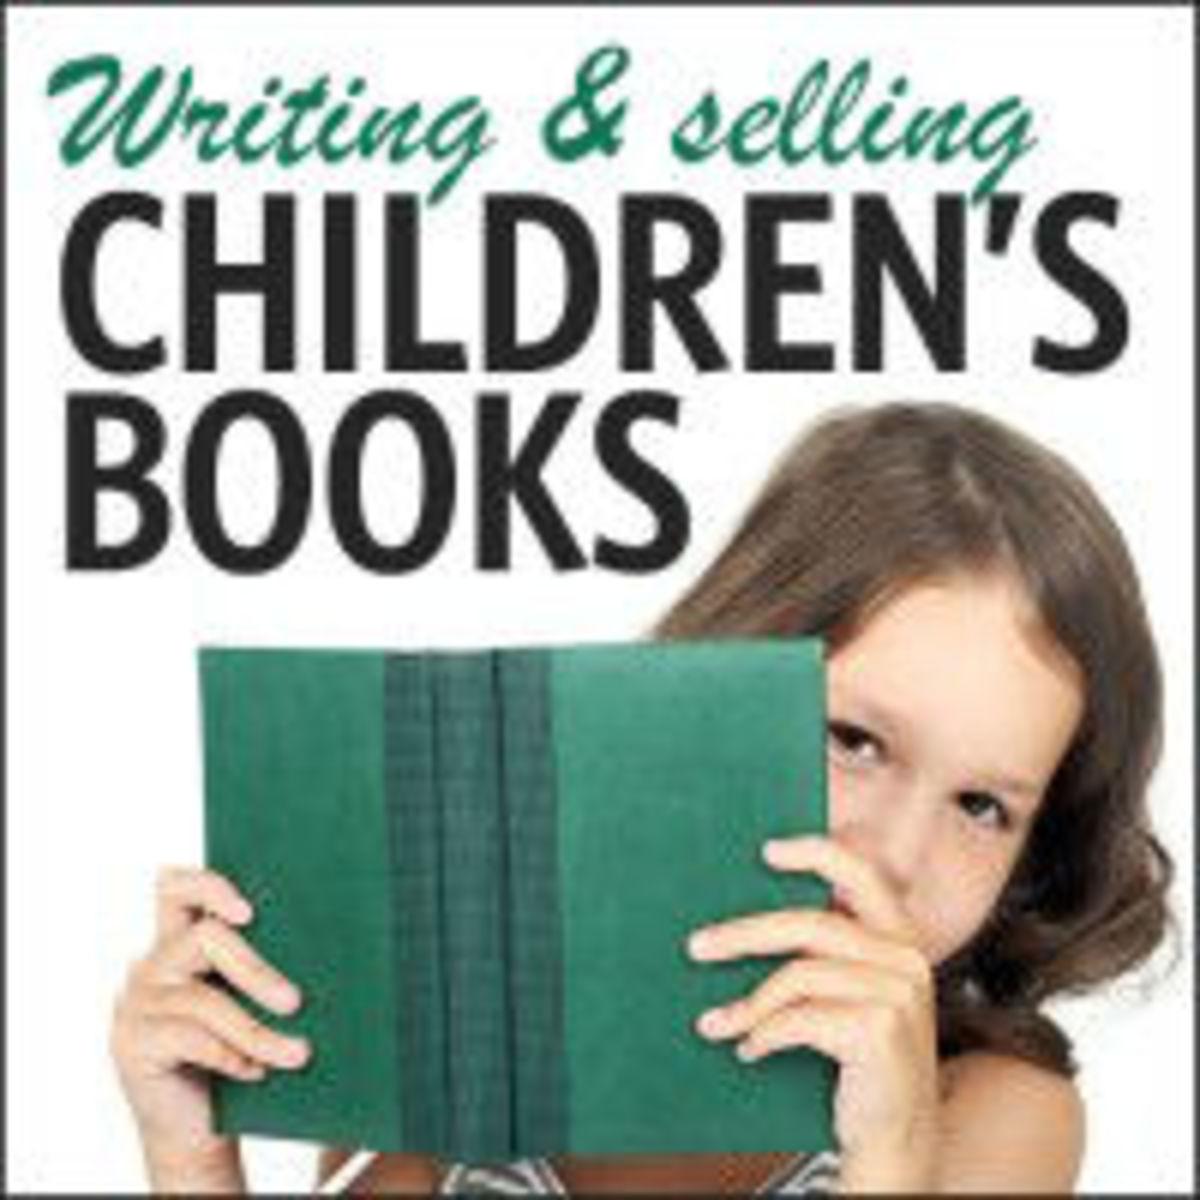 wd_childrensbooks-500_1